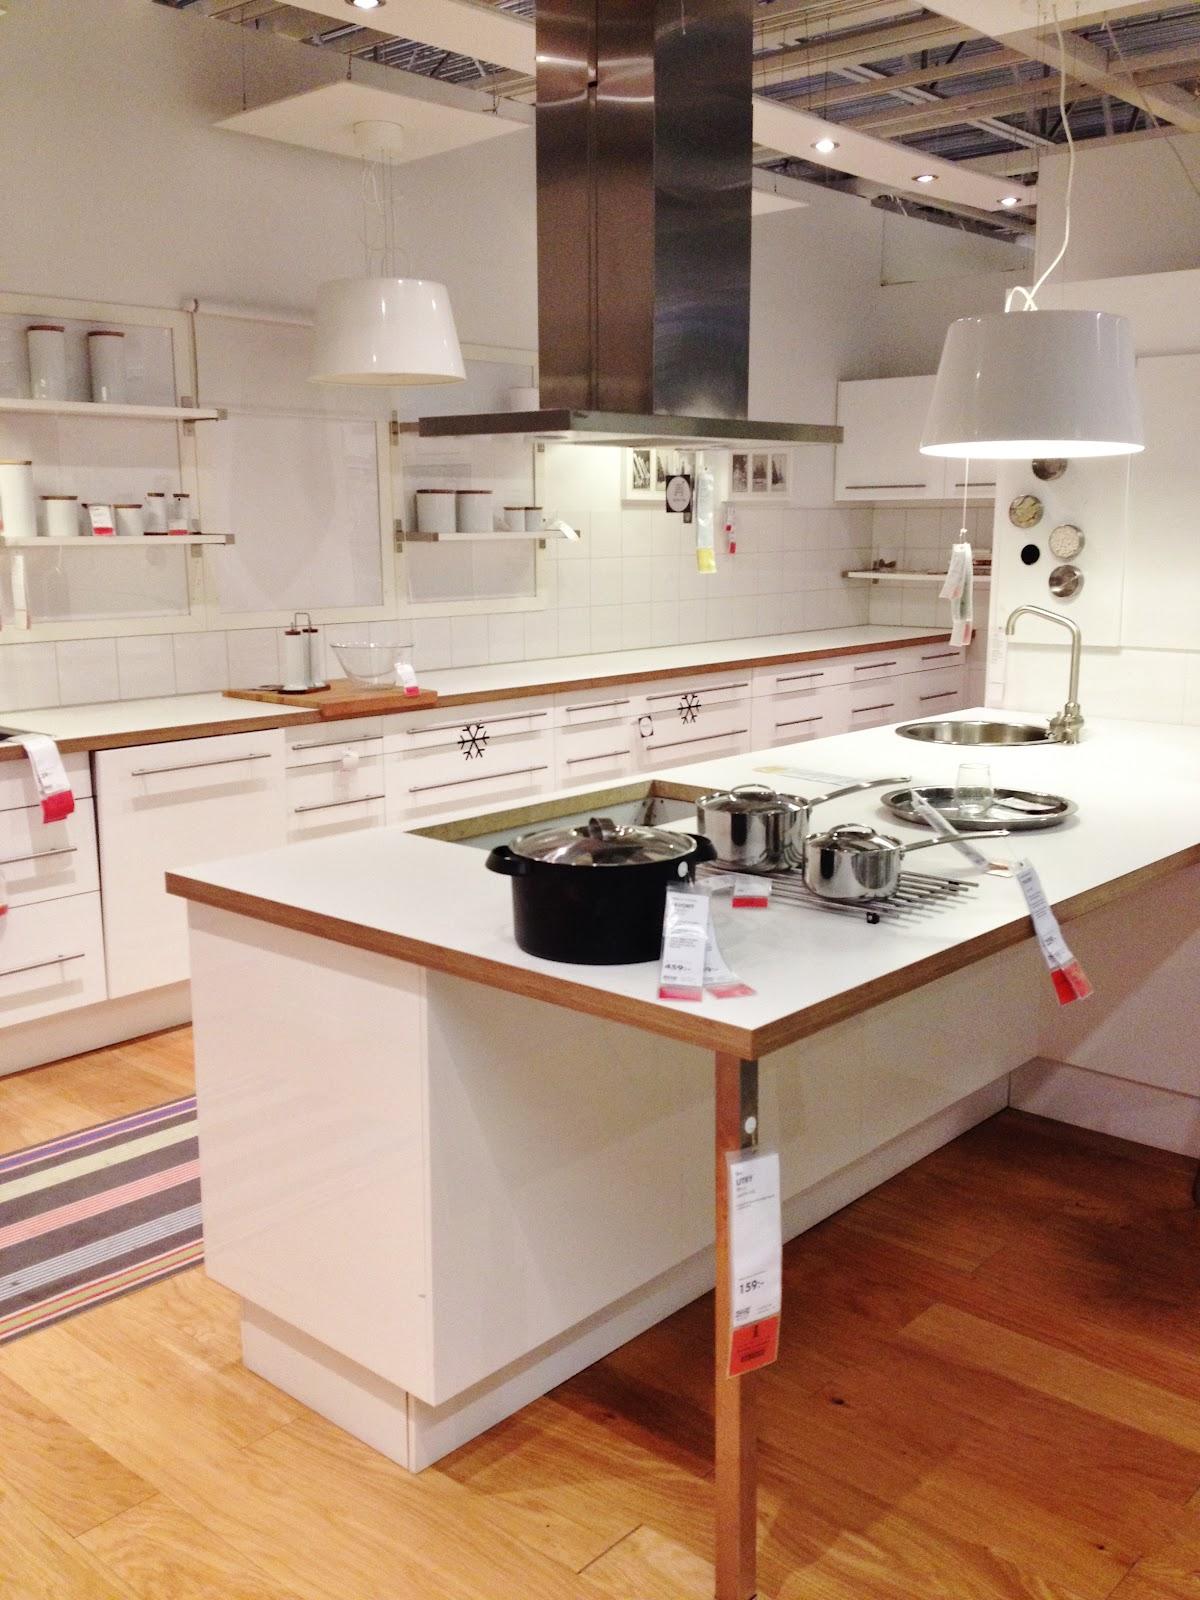 Vita Kok Ikea : vita kok ikea  och moderna kok men forutom de vita koken fanns